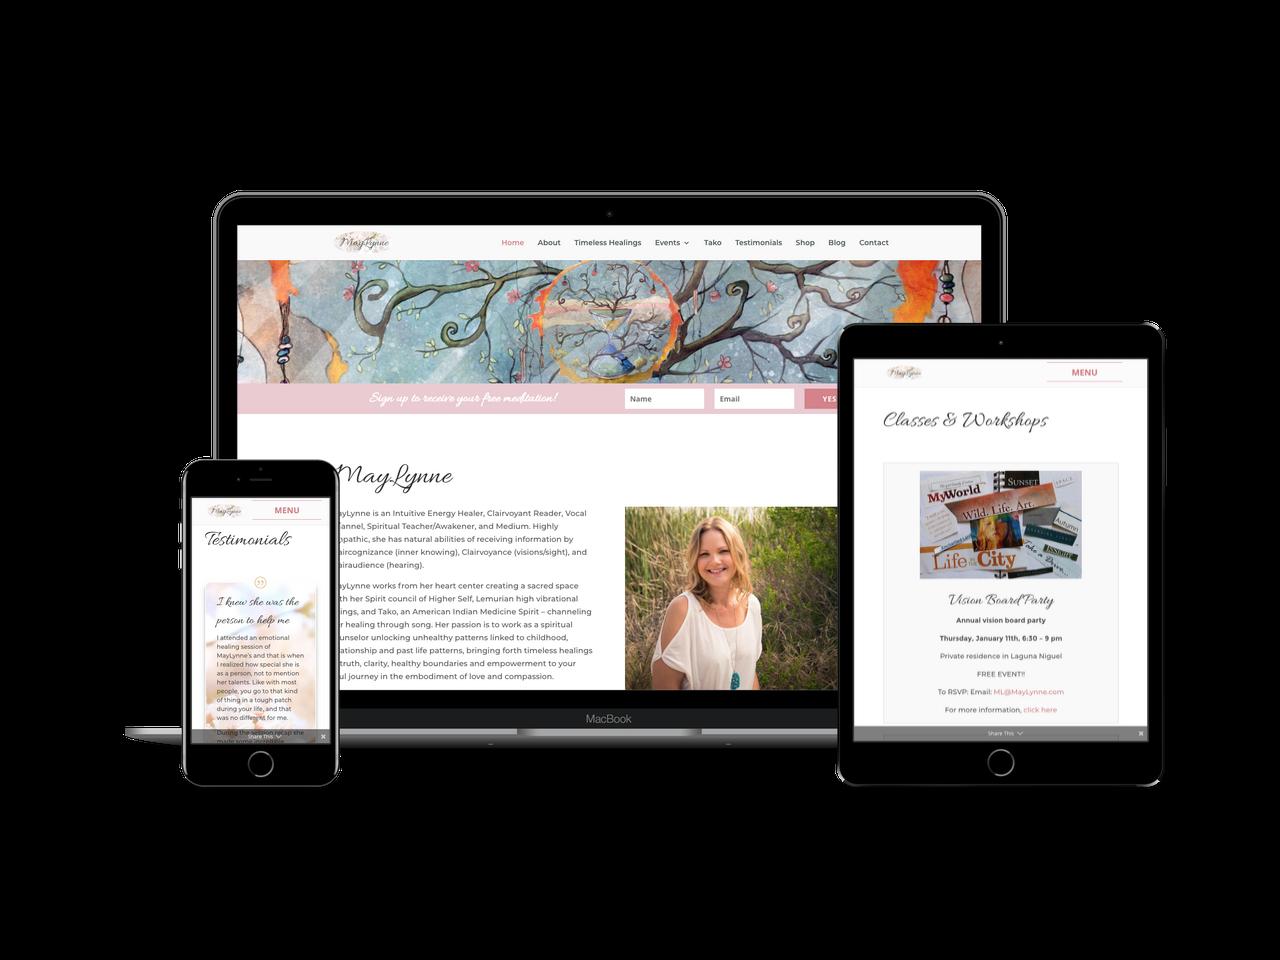 MayLynne.com - website design with Divi Child theme